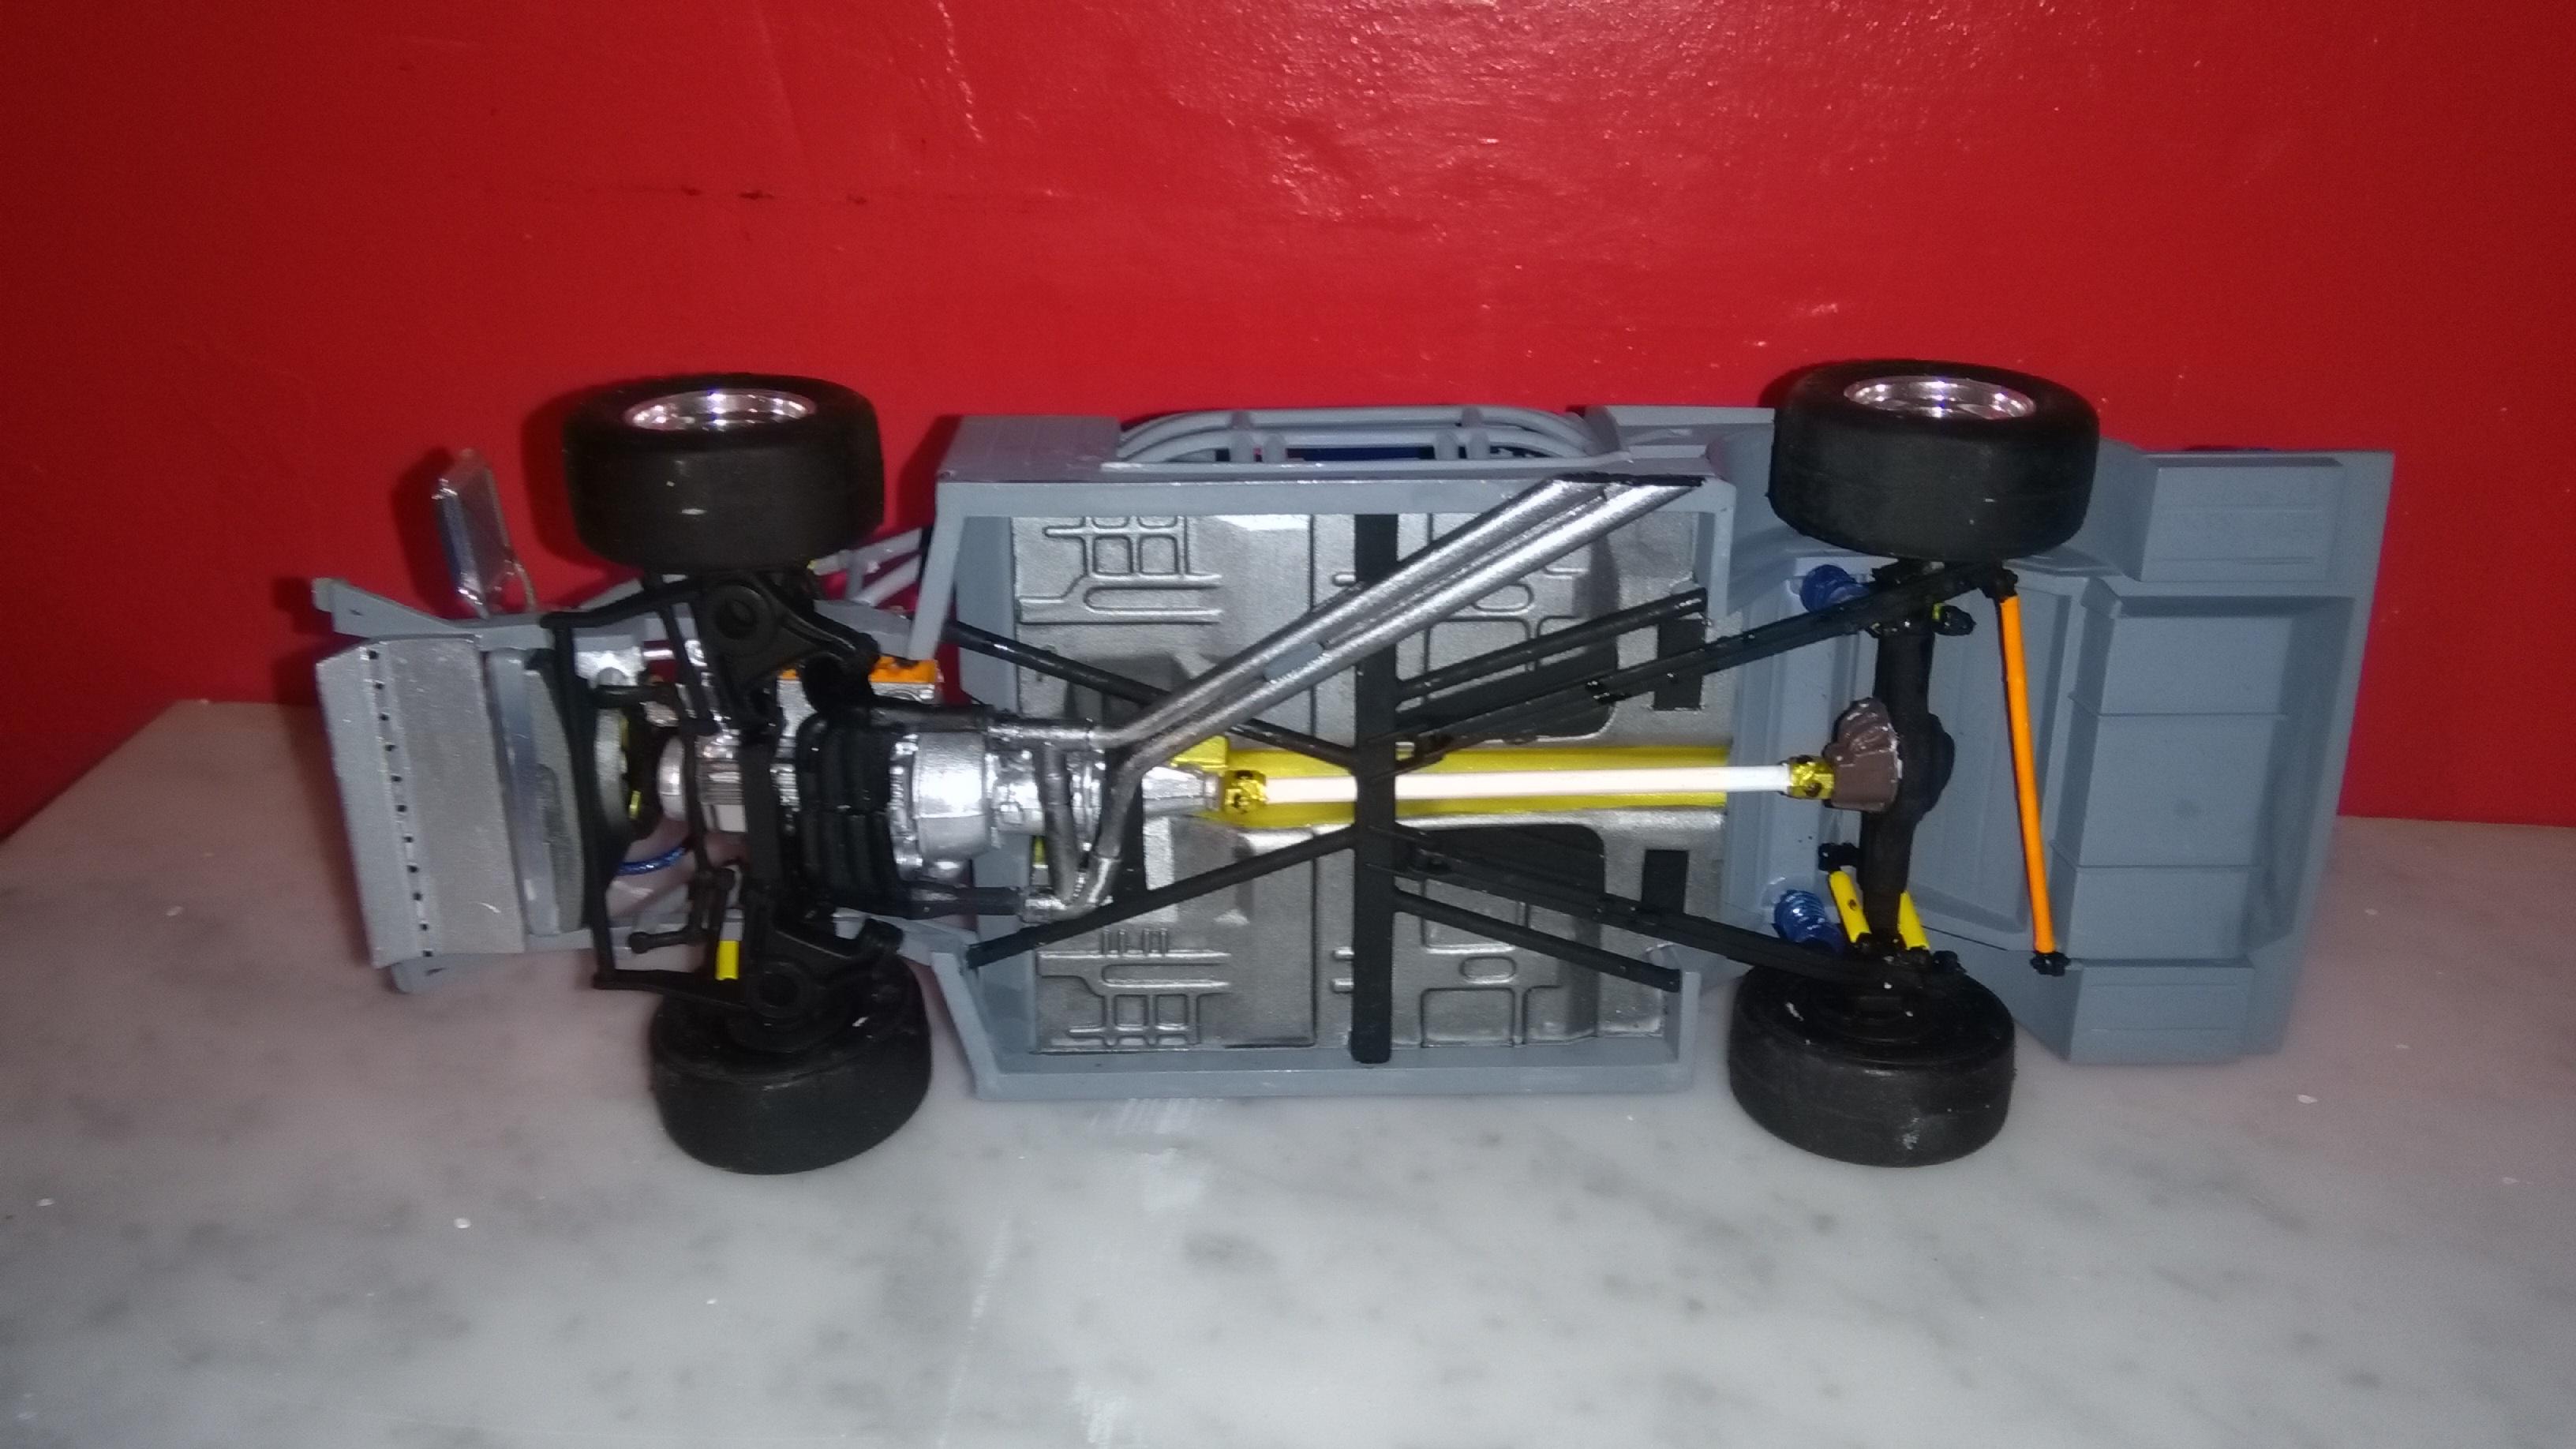 Chevy Monte-Carlo 1983 #11 Darrell Waltrip Pepsi  959099IMG20170422213559